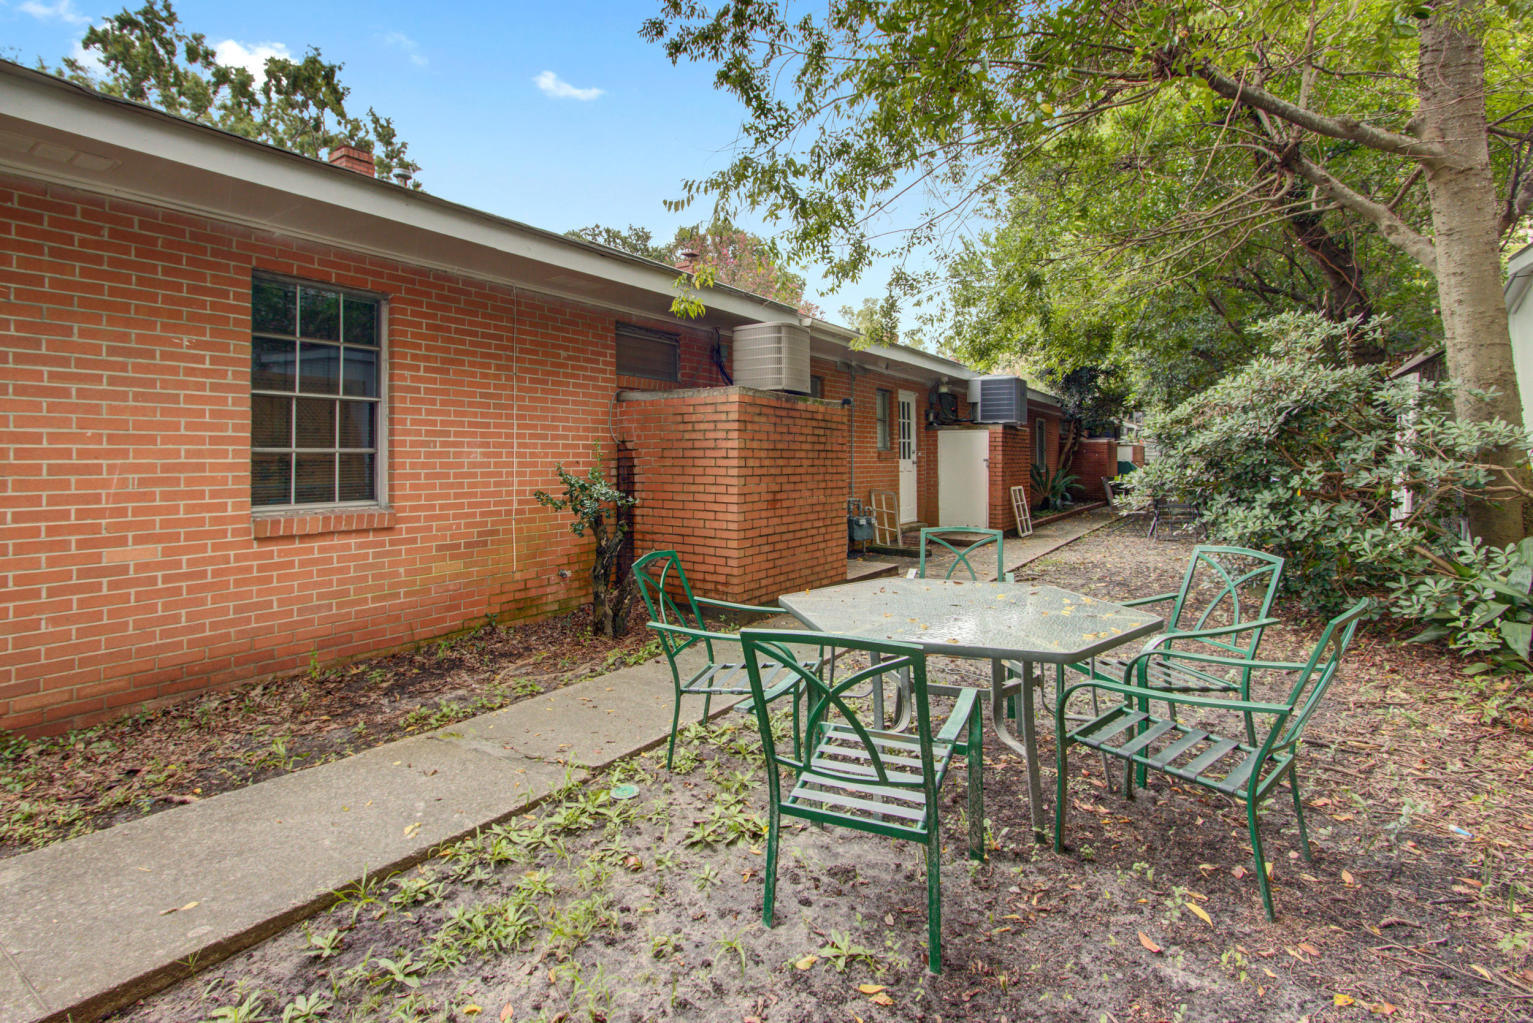 Rutledge Green Homes For Sale - 173 Rutledge, Charleston, SC - 4